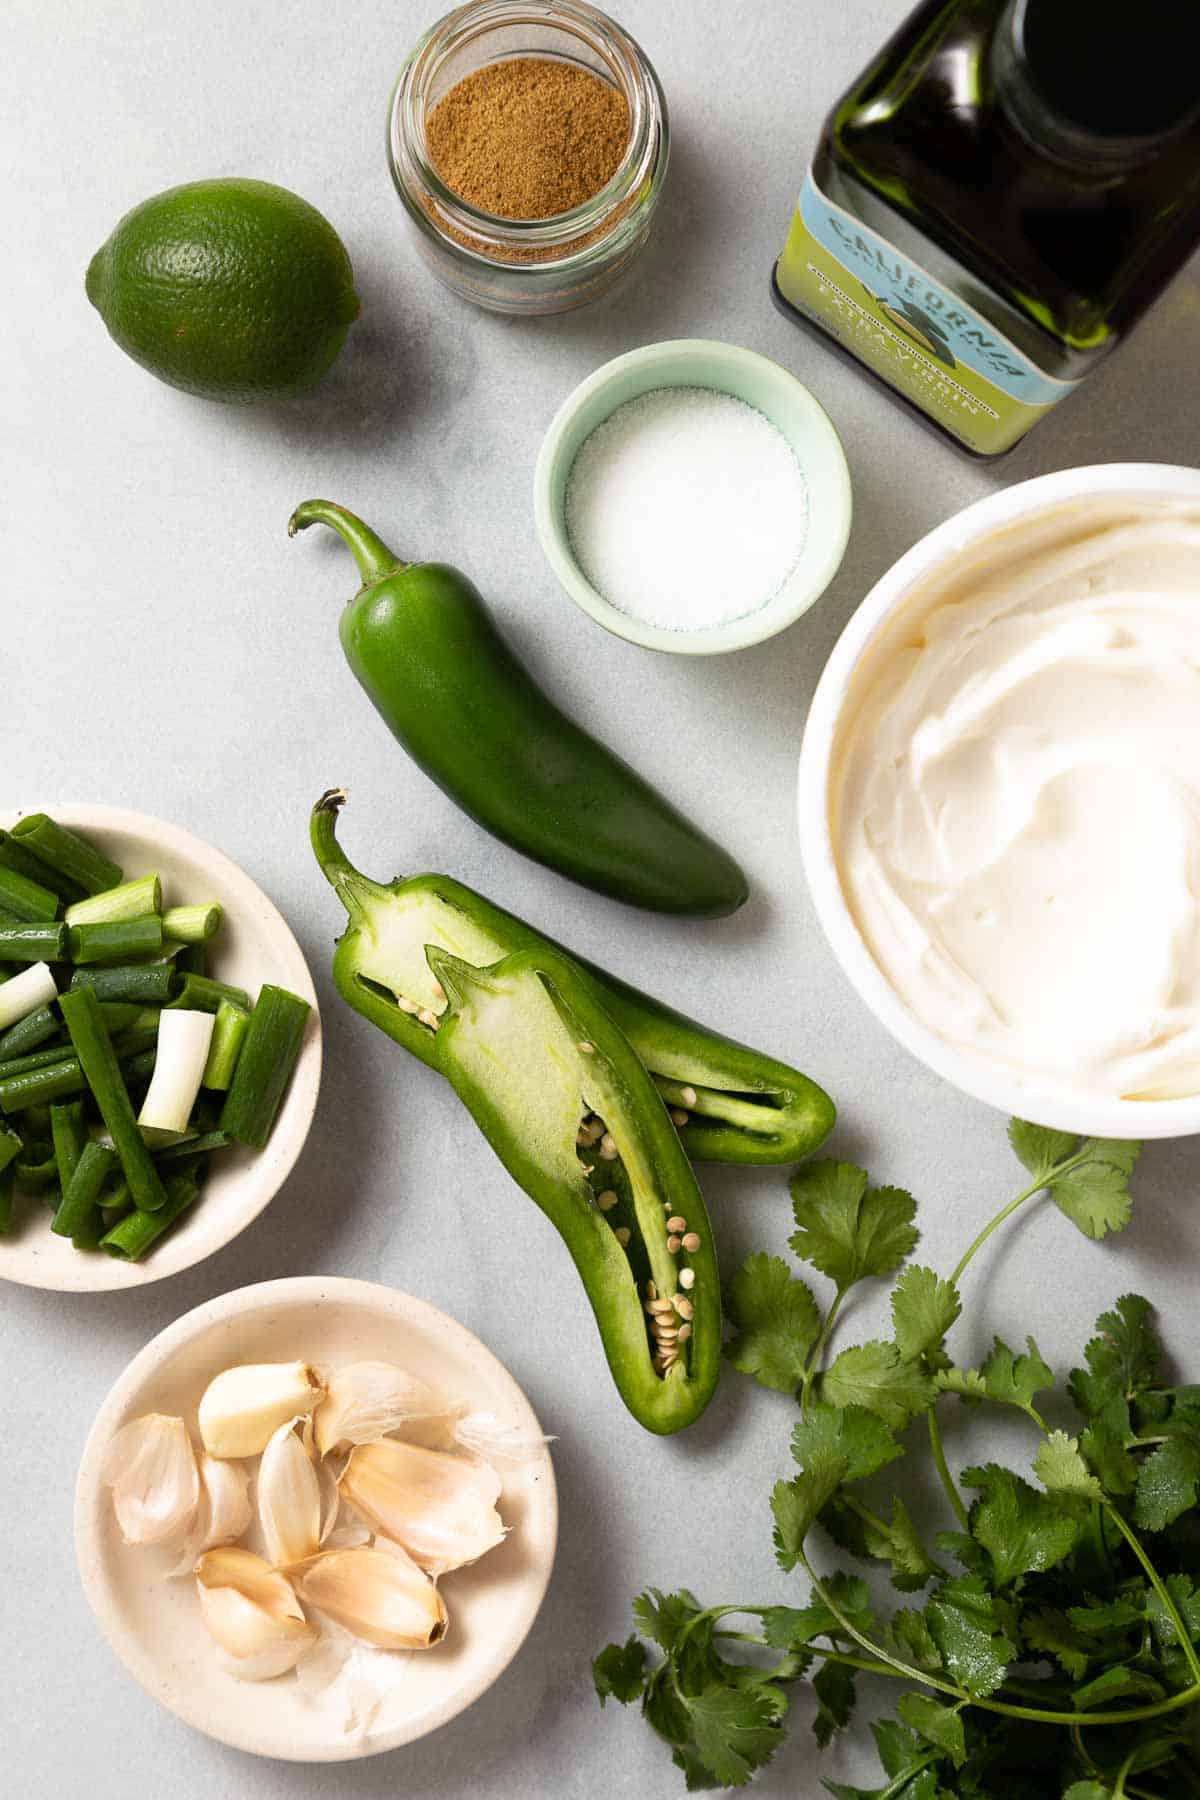 jalepeno peppers next to oil, greek yogurt, cilantro, and garlic